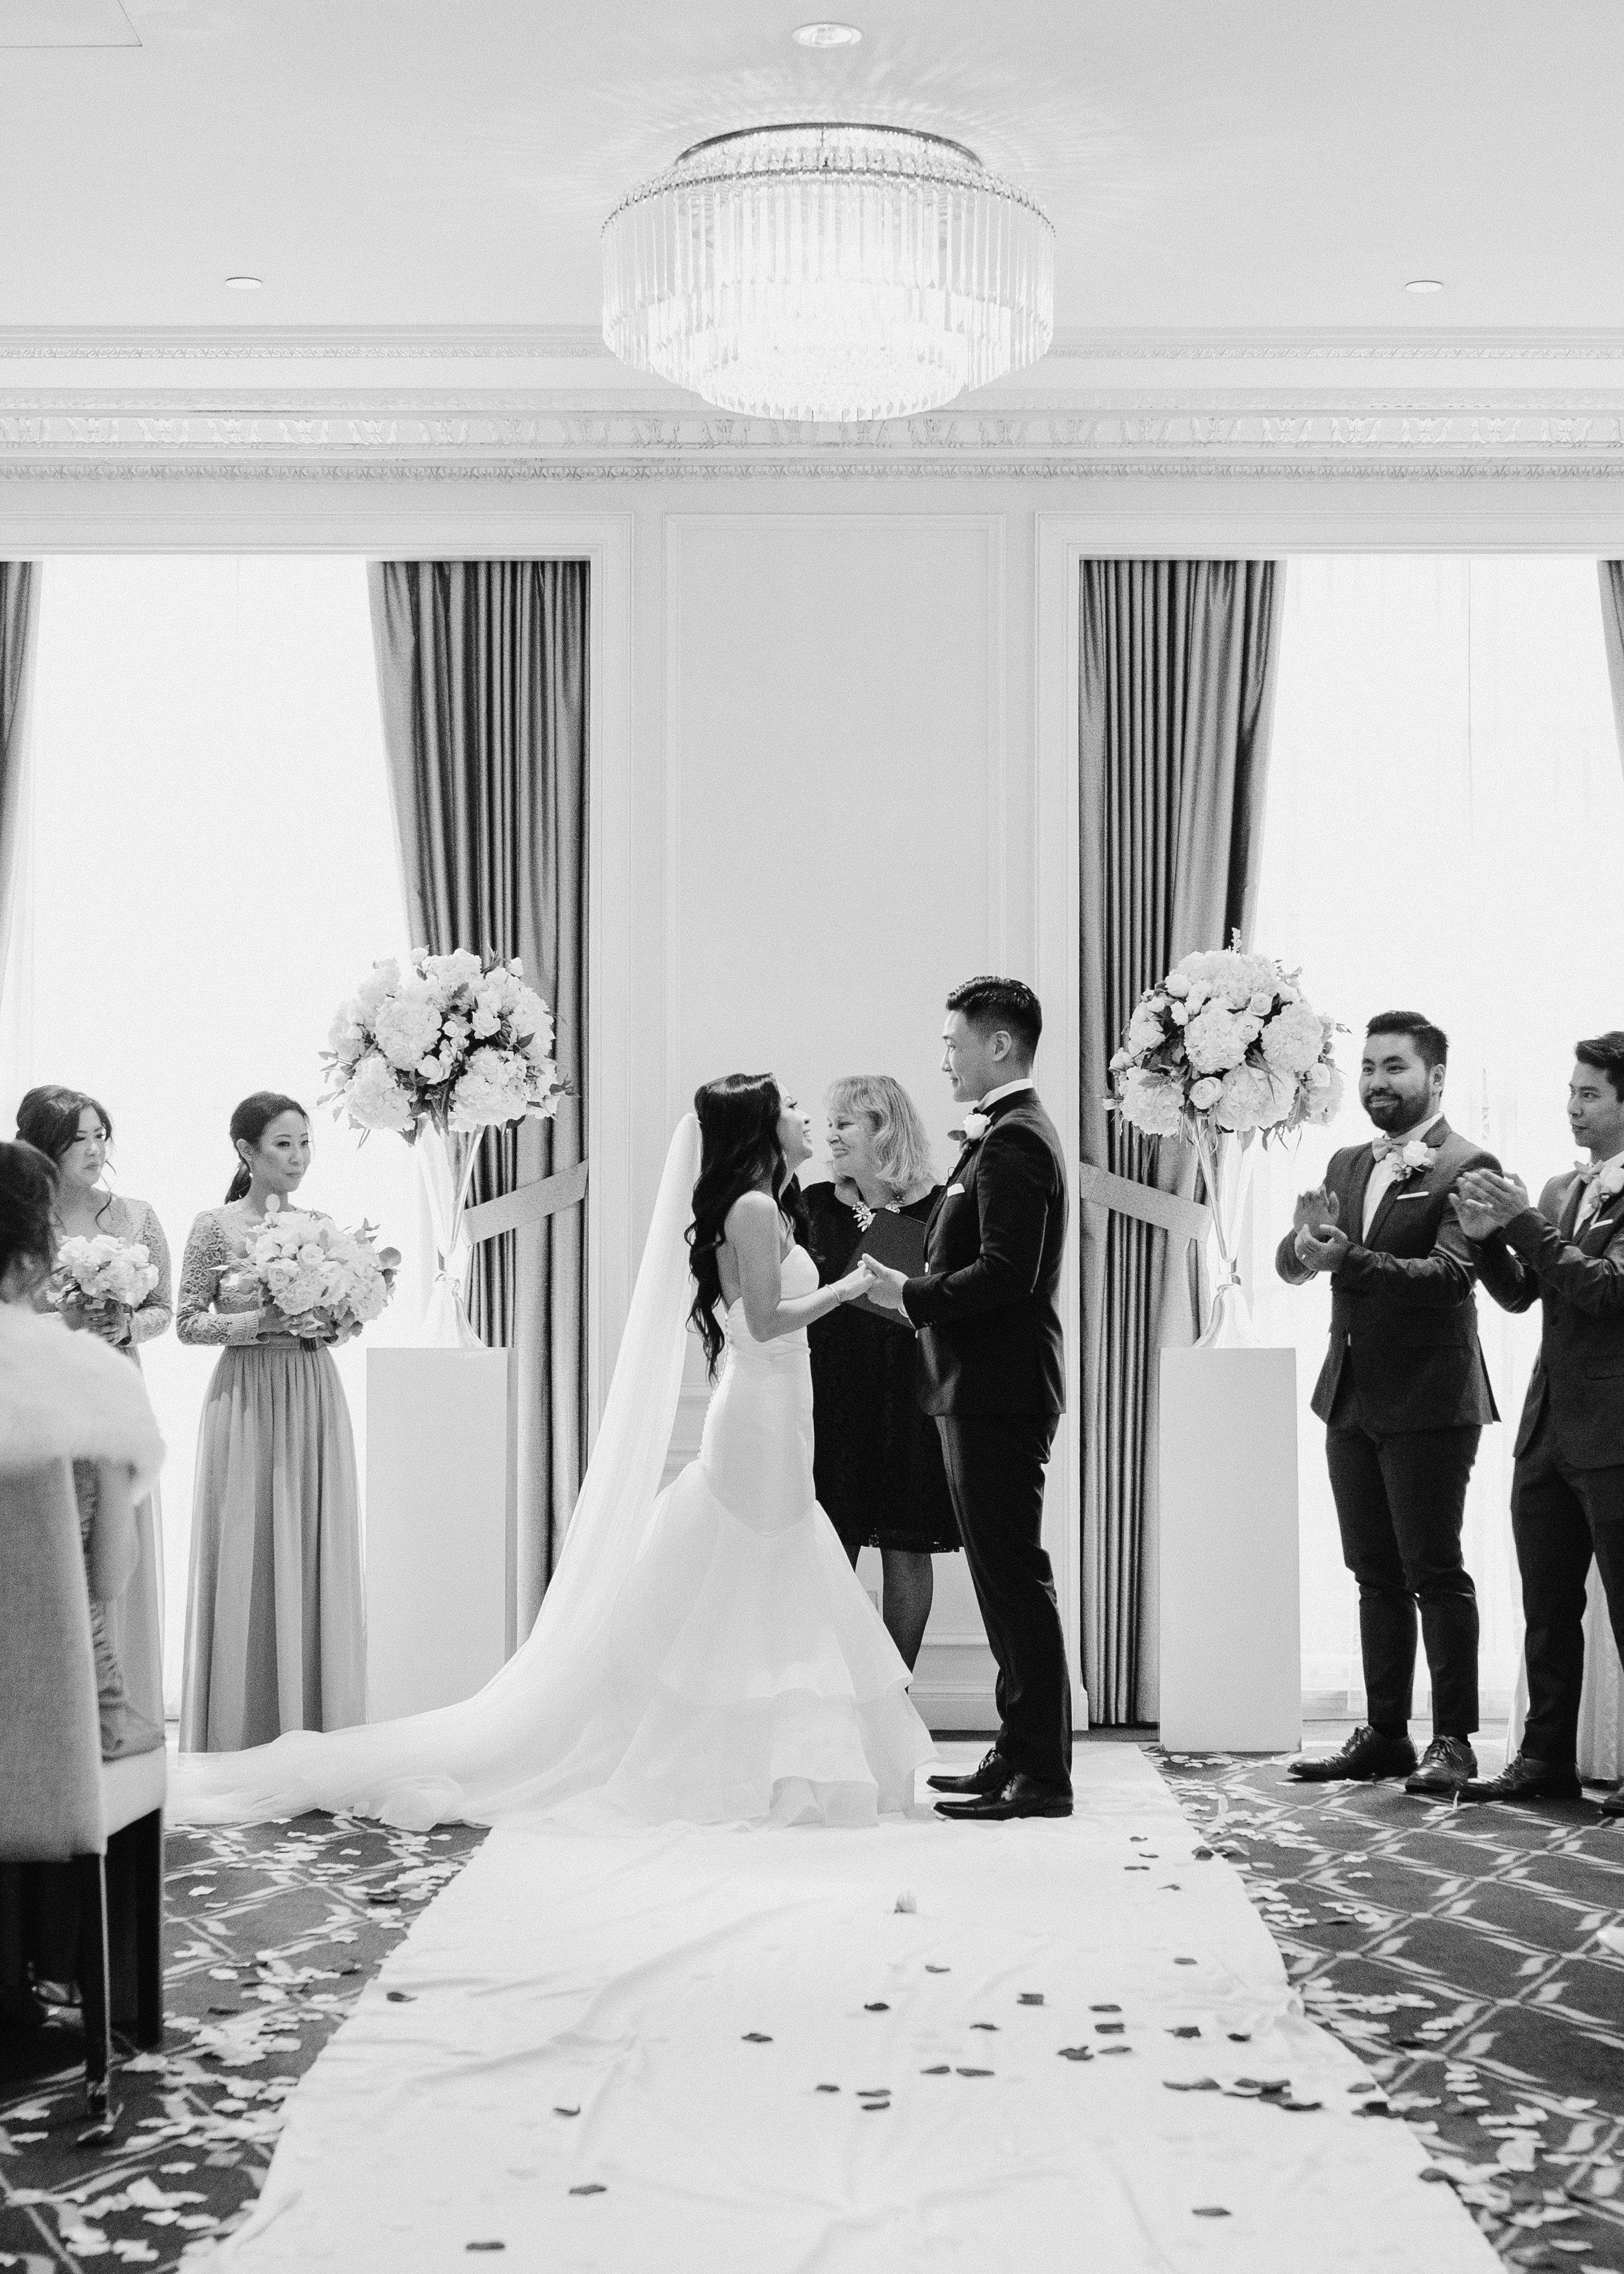 HeraStudios_Selects_Full_KatrinaAndrew_Wedding_Version2-371.jpg